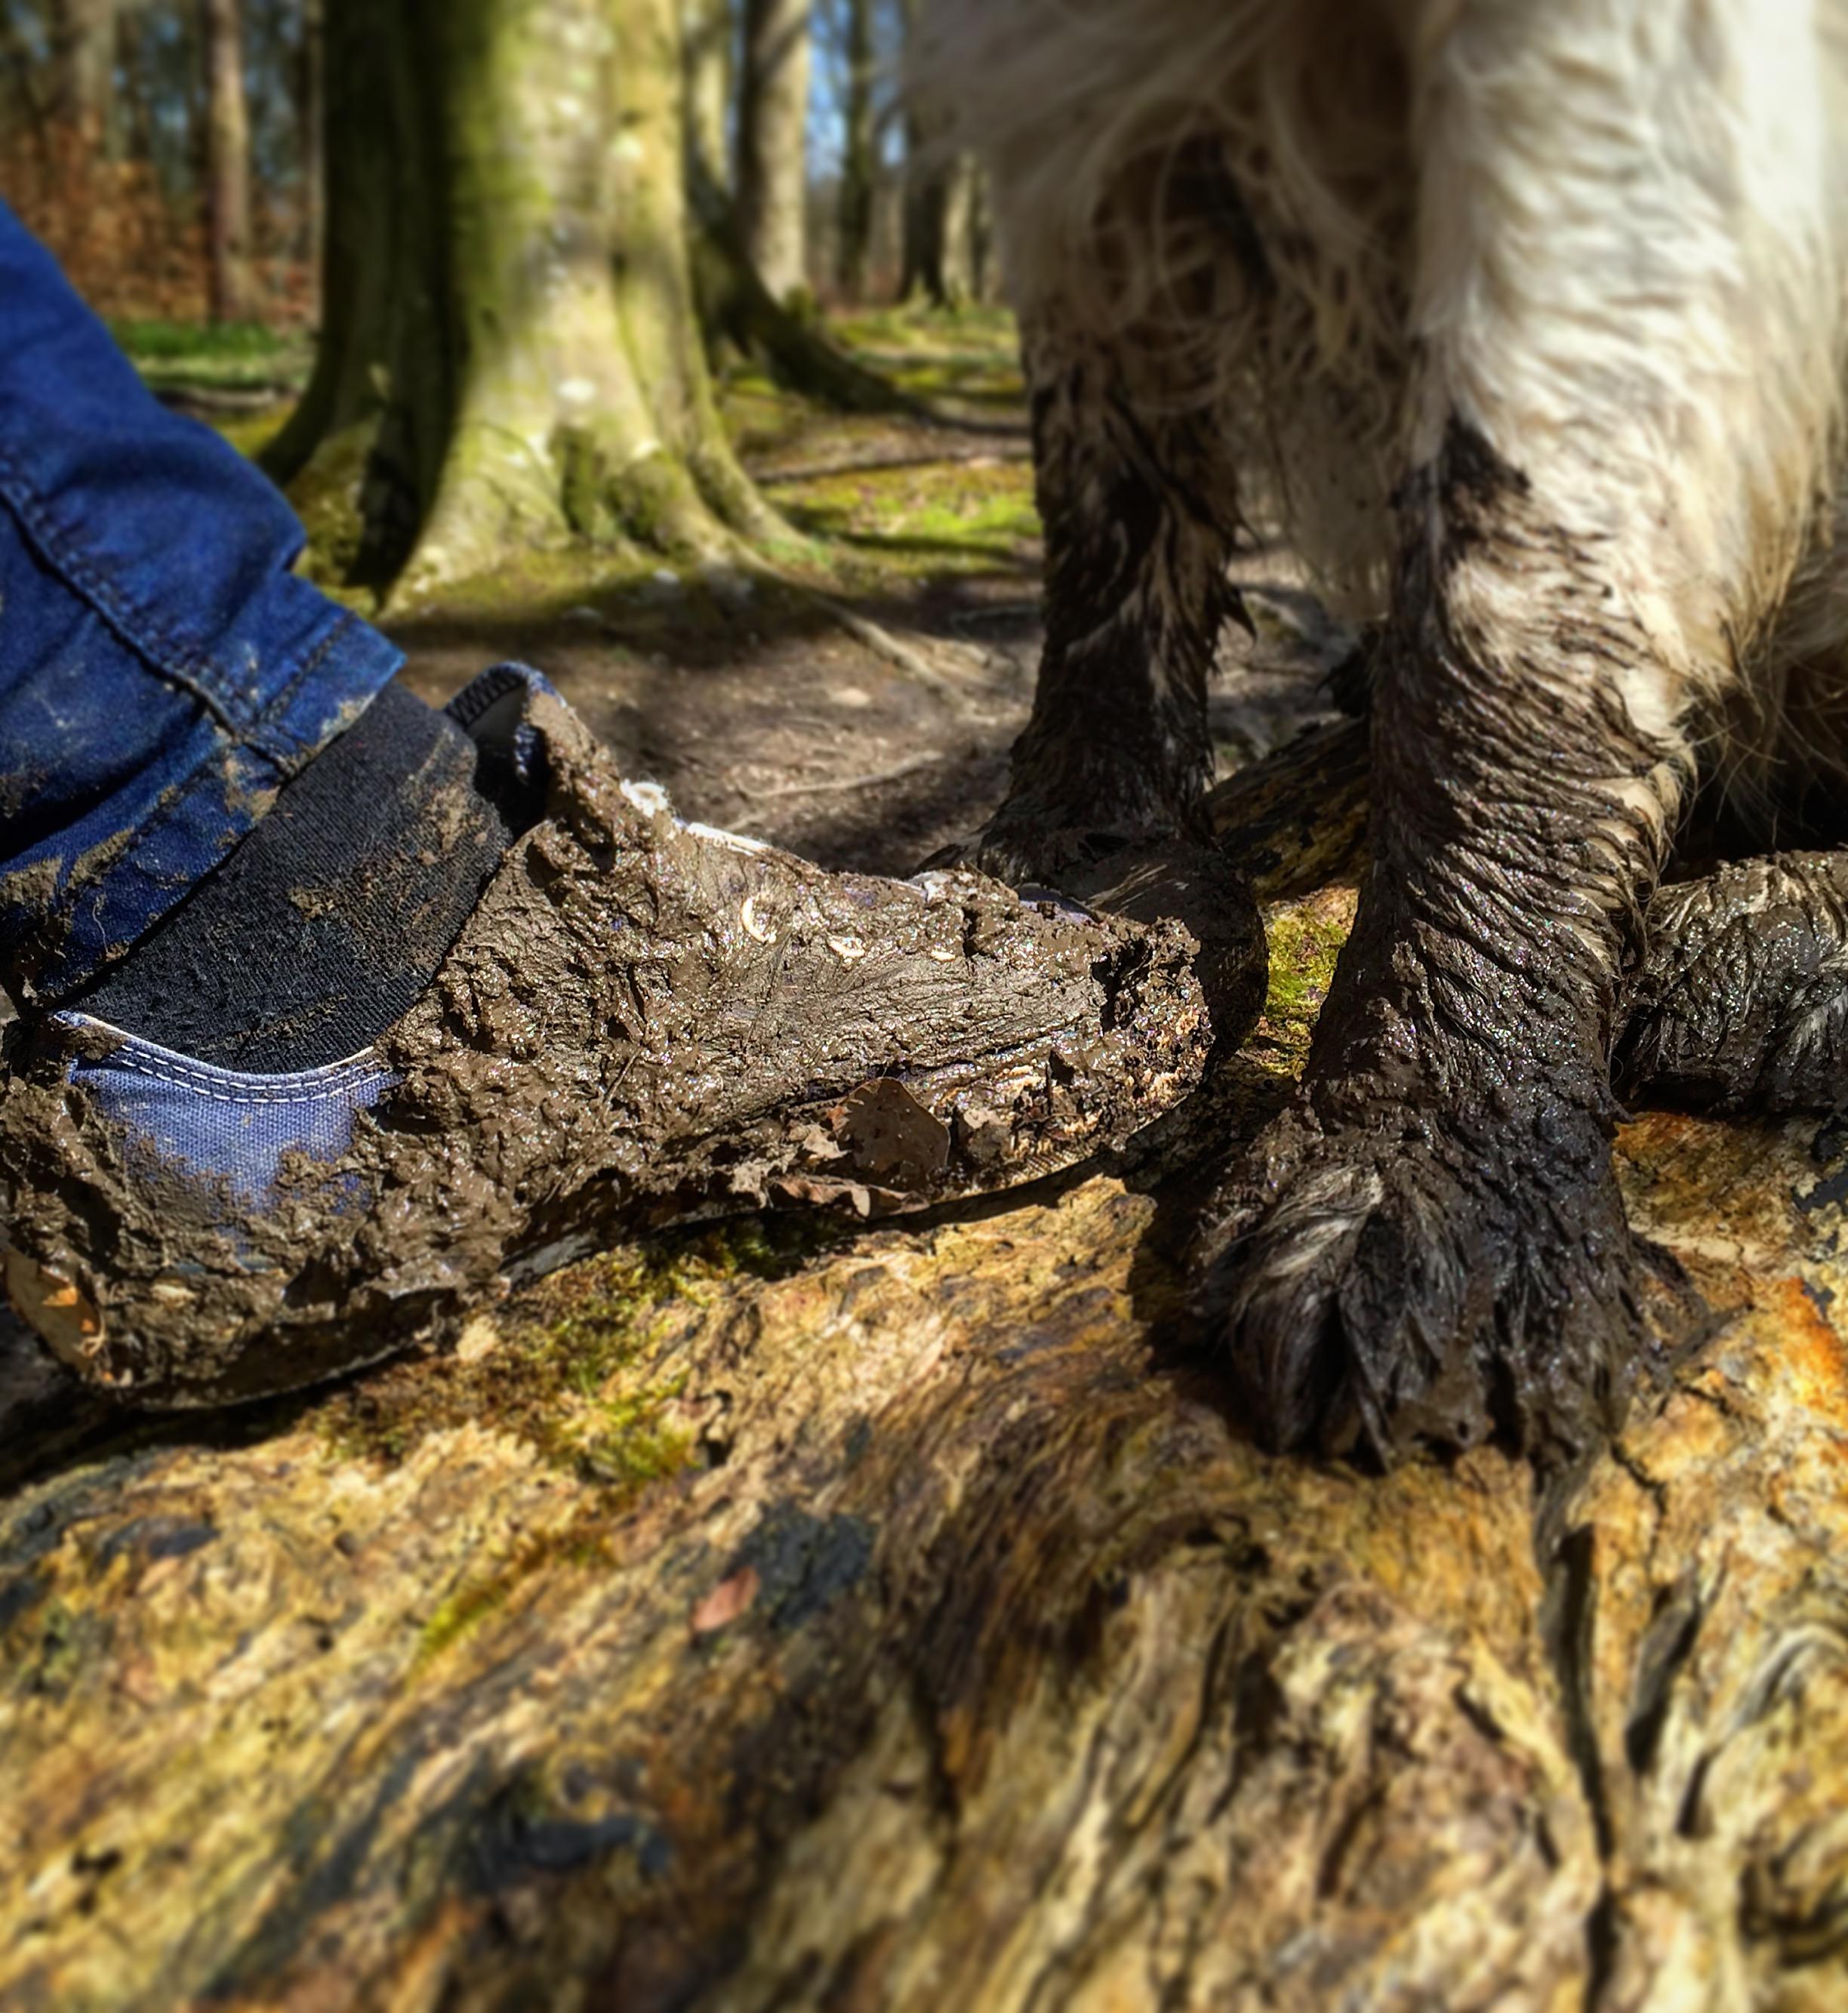 mucky_feet_dog_shoe_helens_bay_to_crawfordsburn_roadtrip_coast_ni_explorer_niexplorer_northern_ireland_blog.jpg